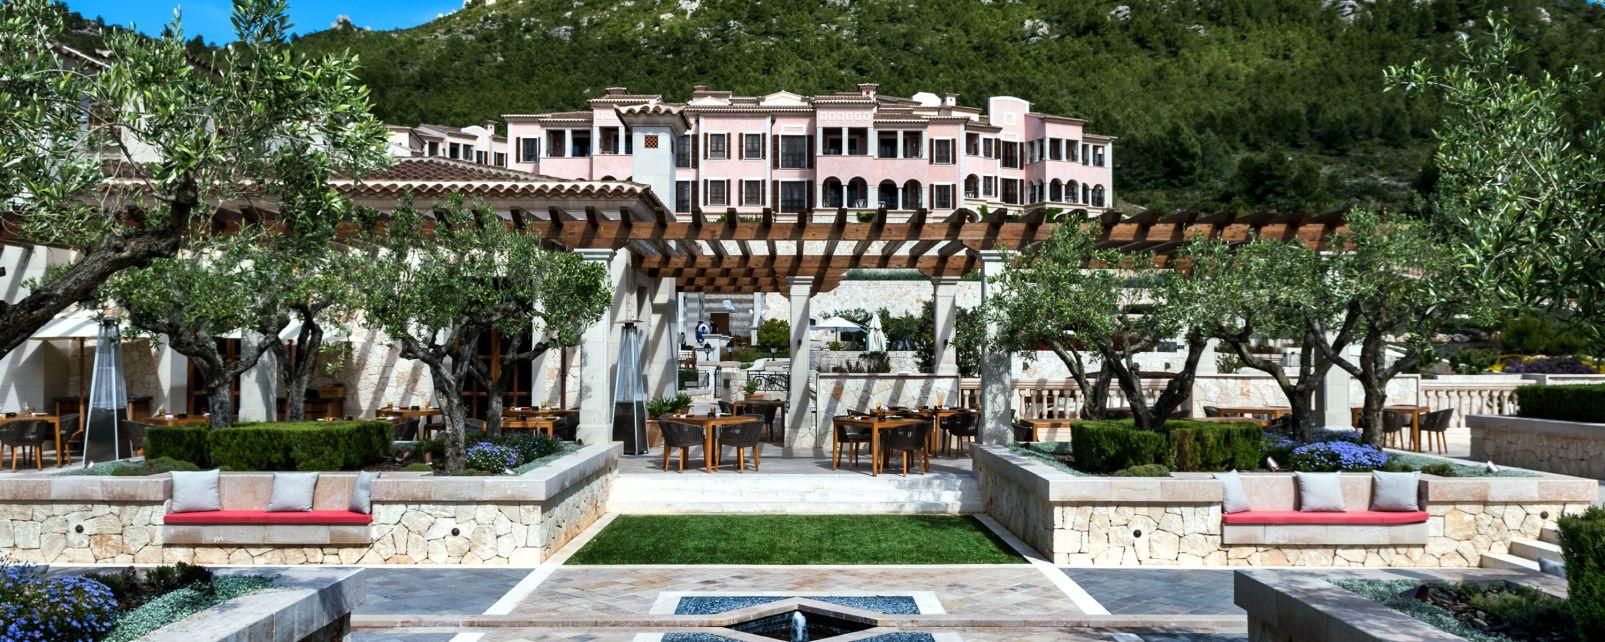 Hôtel Park Hyatt Mallorca